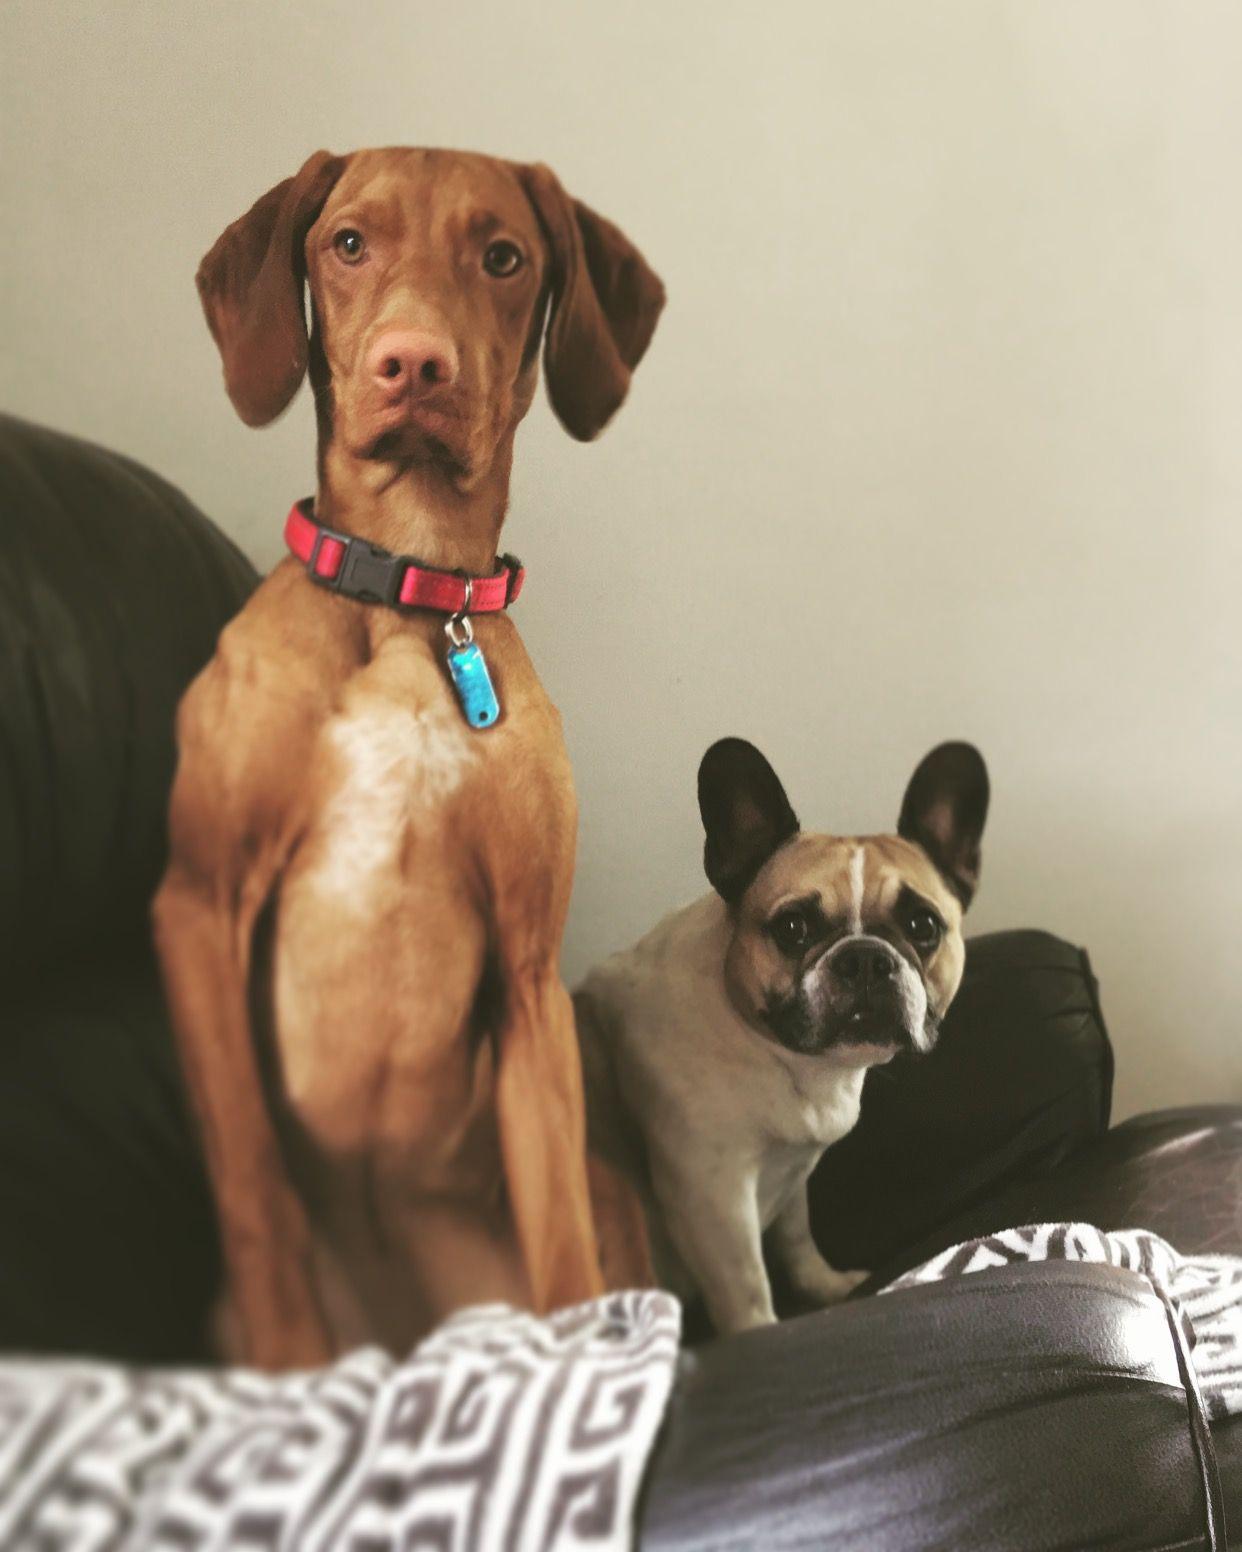 Vizsla Puppy Frenchie French Bulldog Vizsla Puppies Puppies Dogs